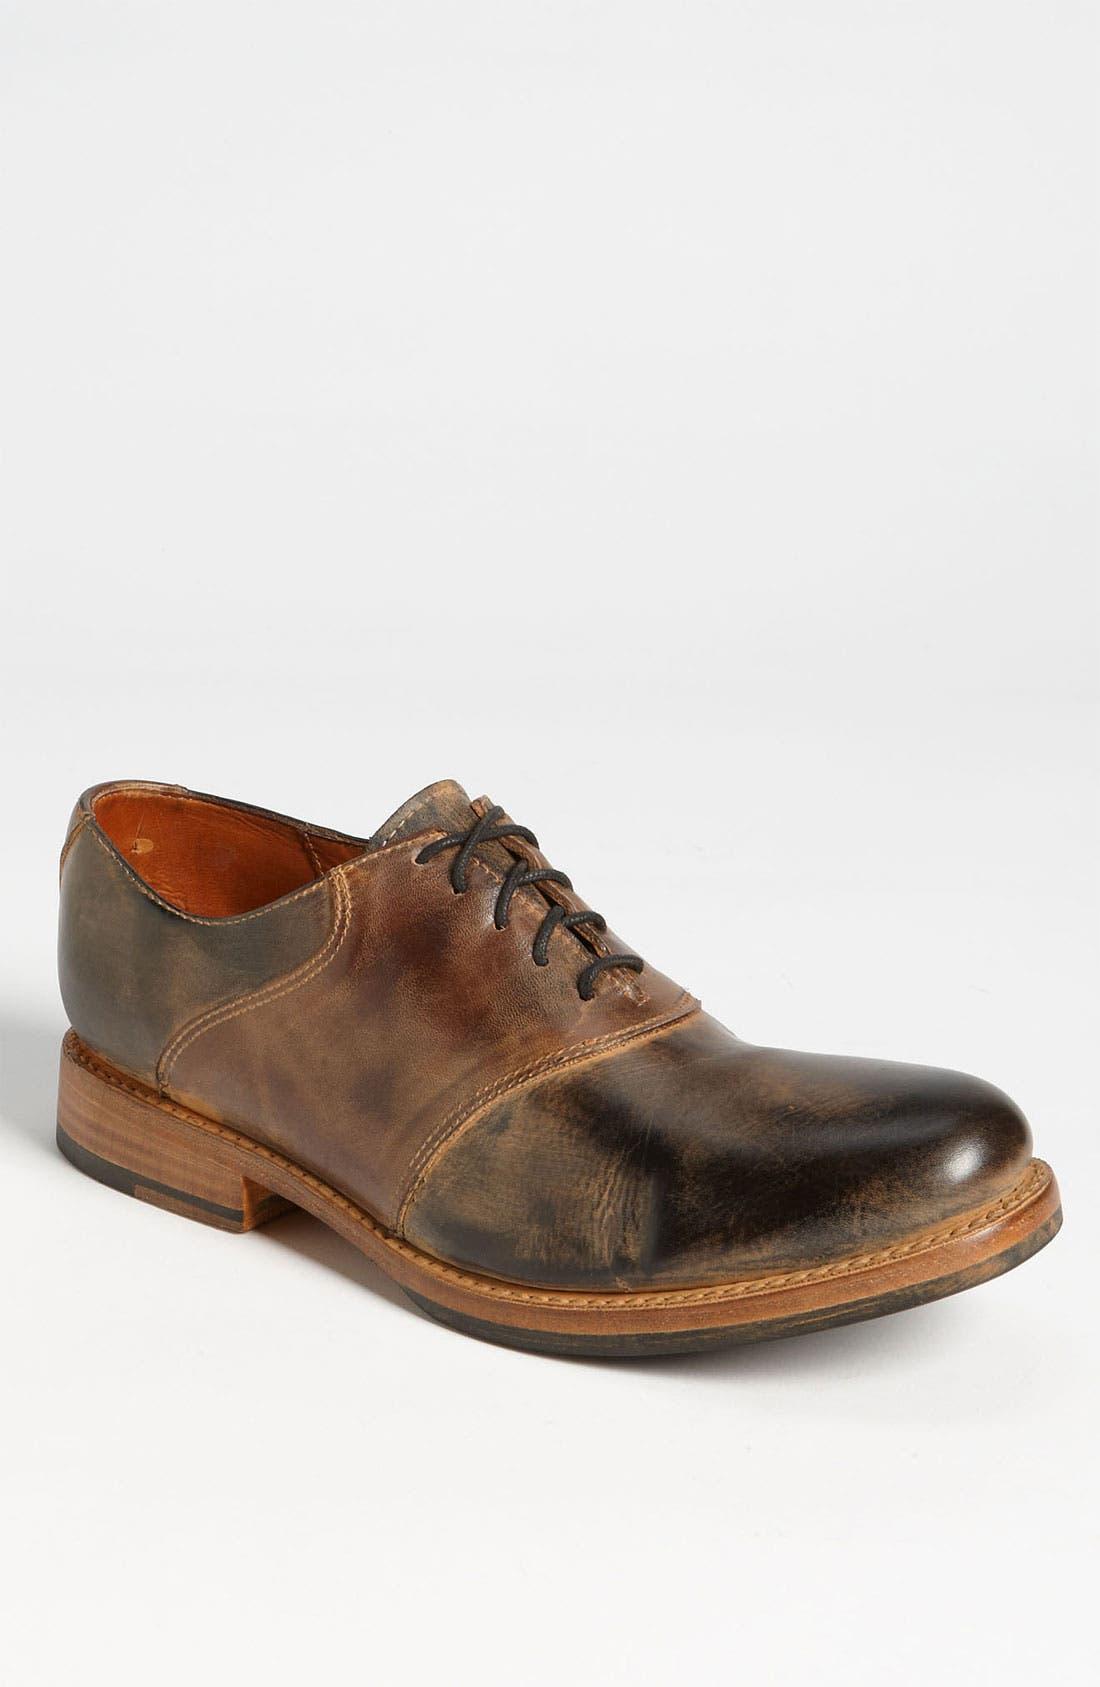 Main Image - Bed Stu 'Edison' Cap Toe Oxford (Men)